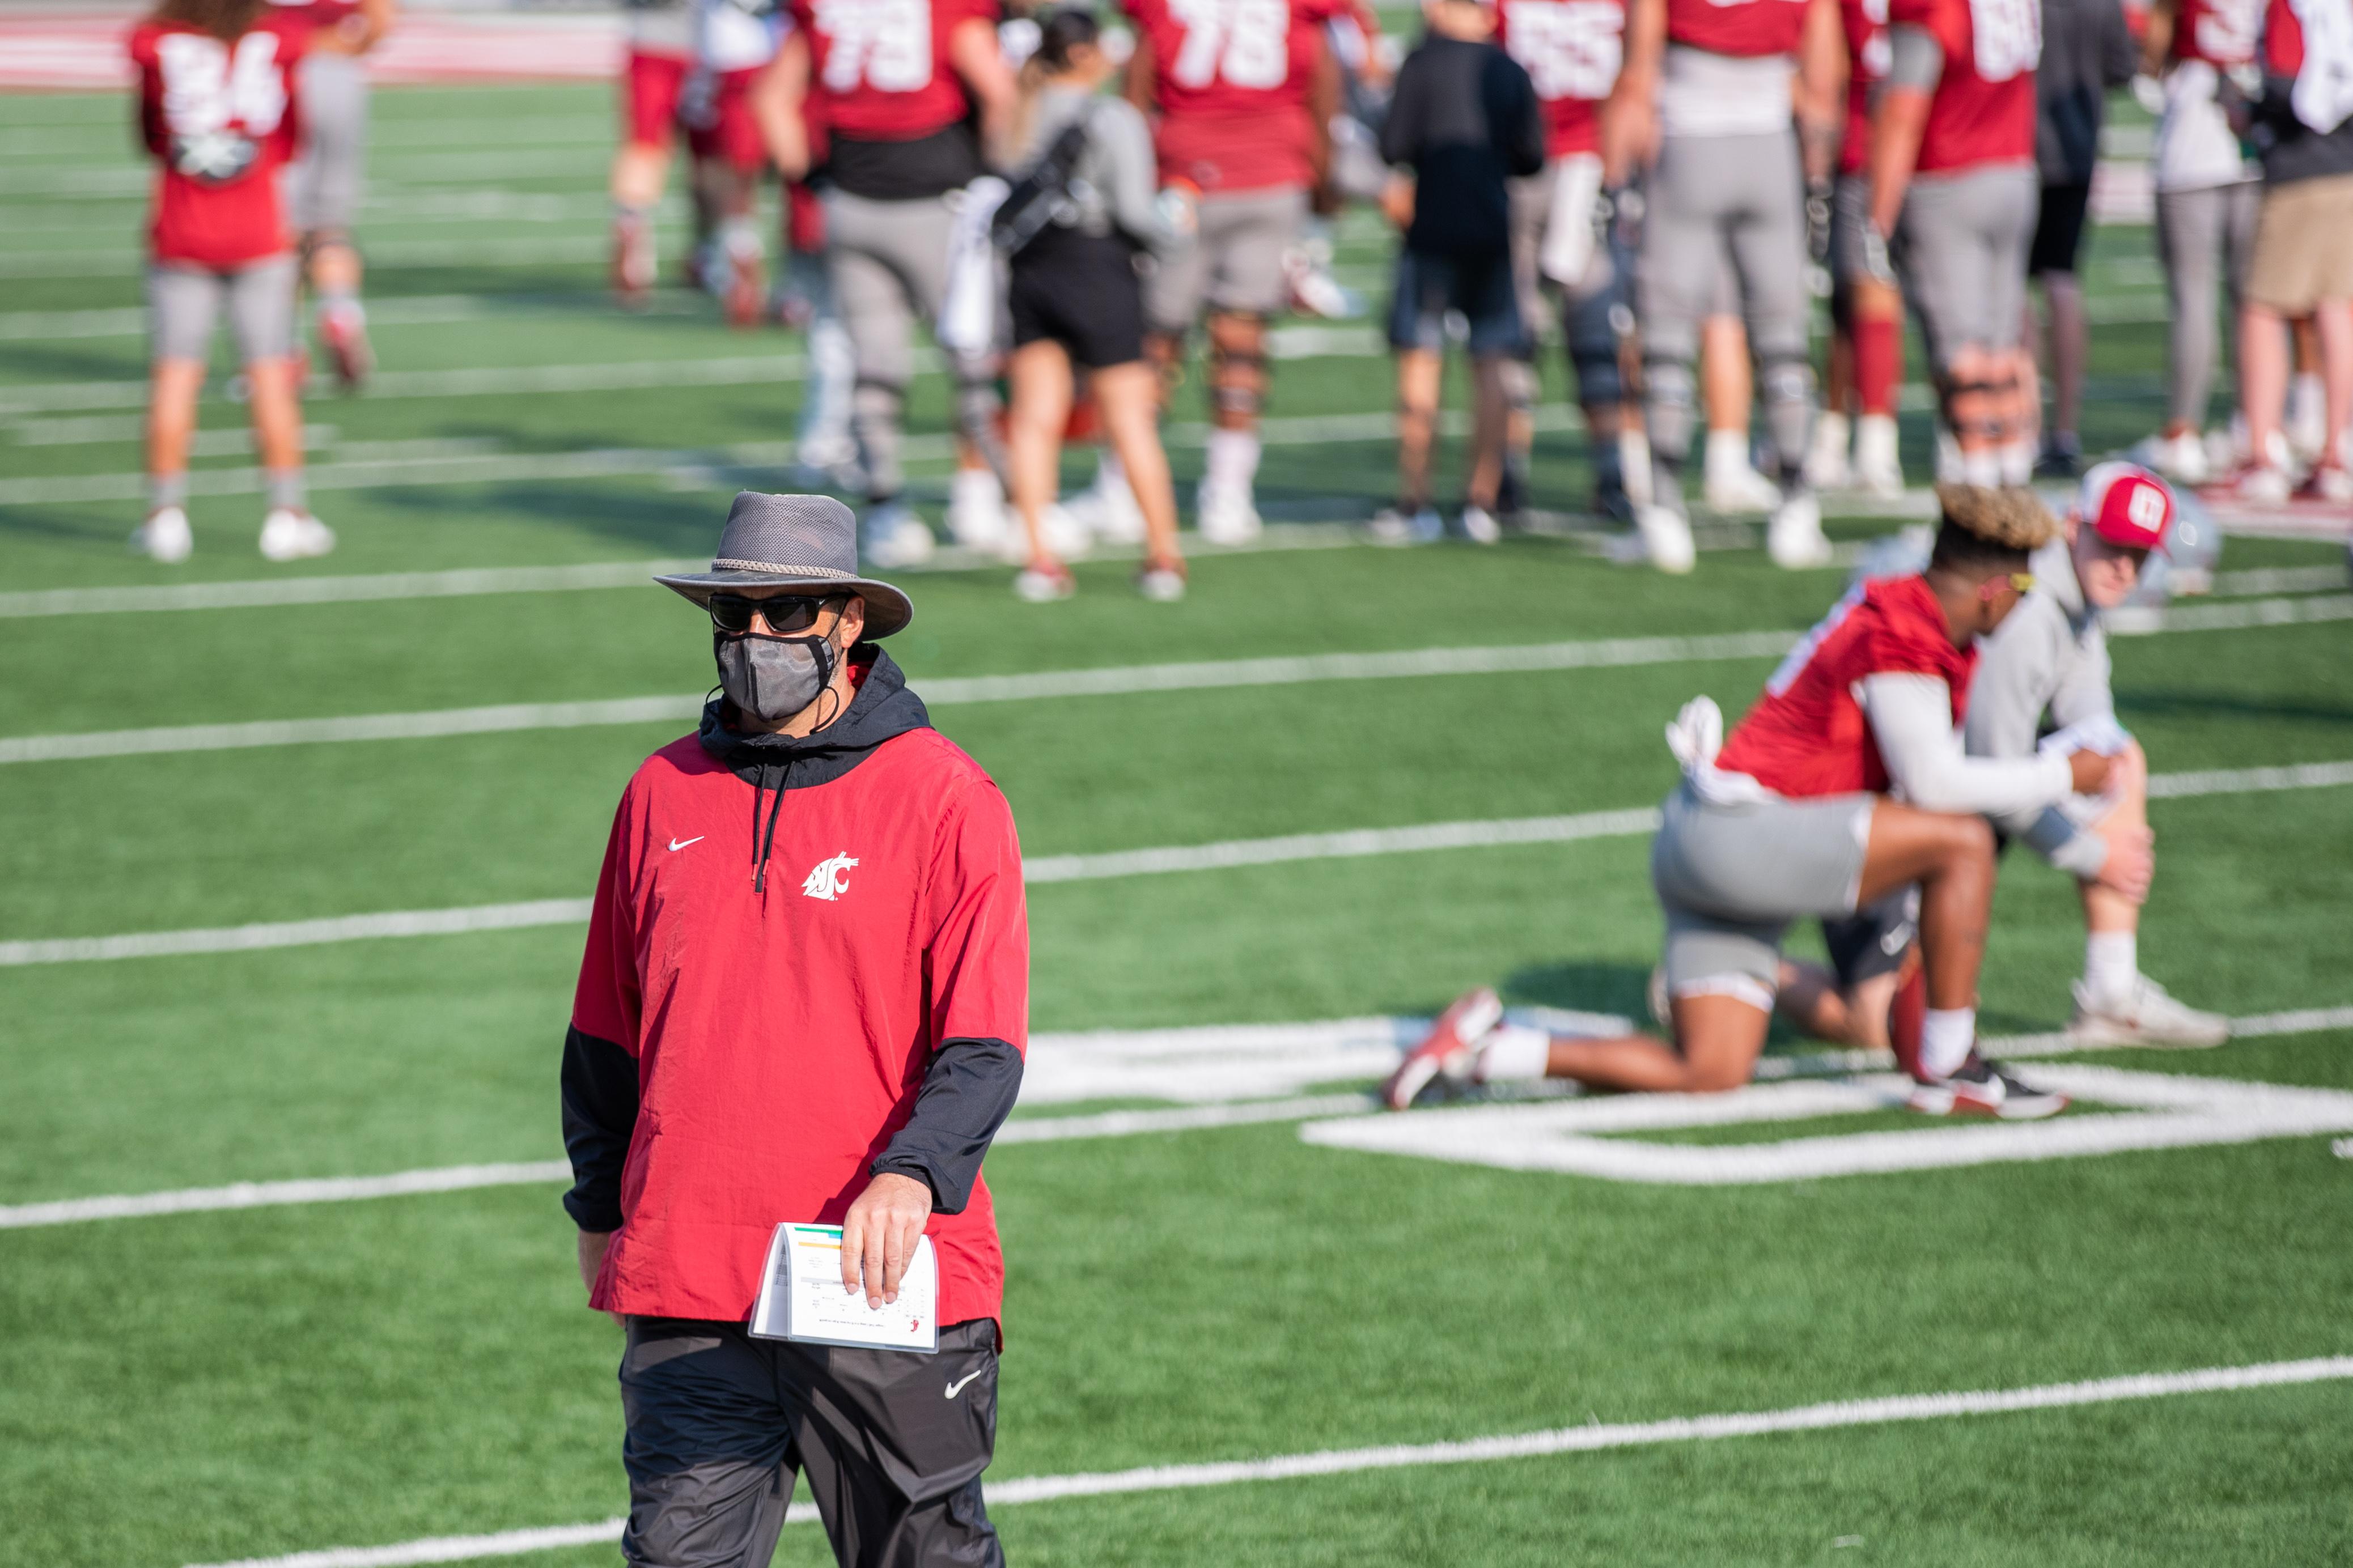 Washington State University Football Fall Practice 12 - Head Coach Nick Rolovich